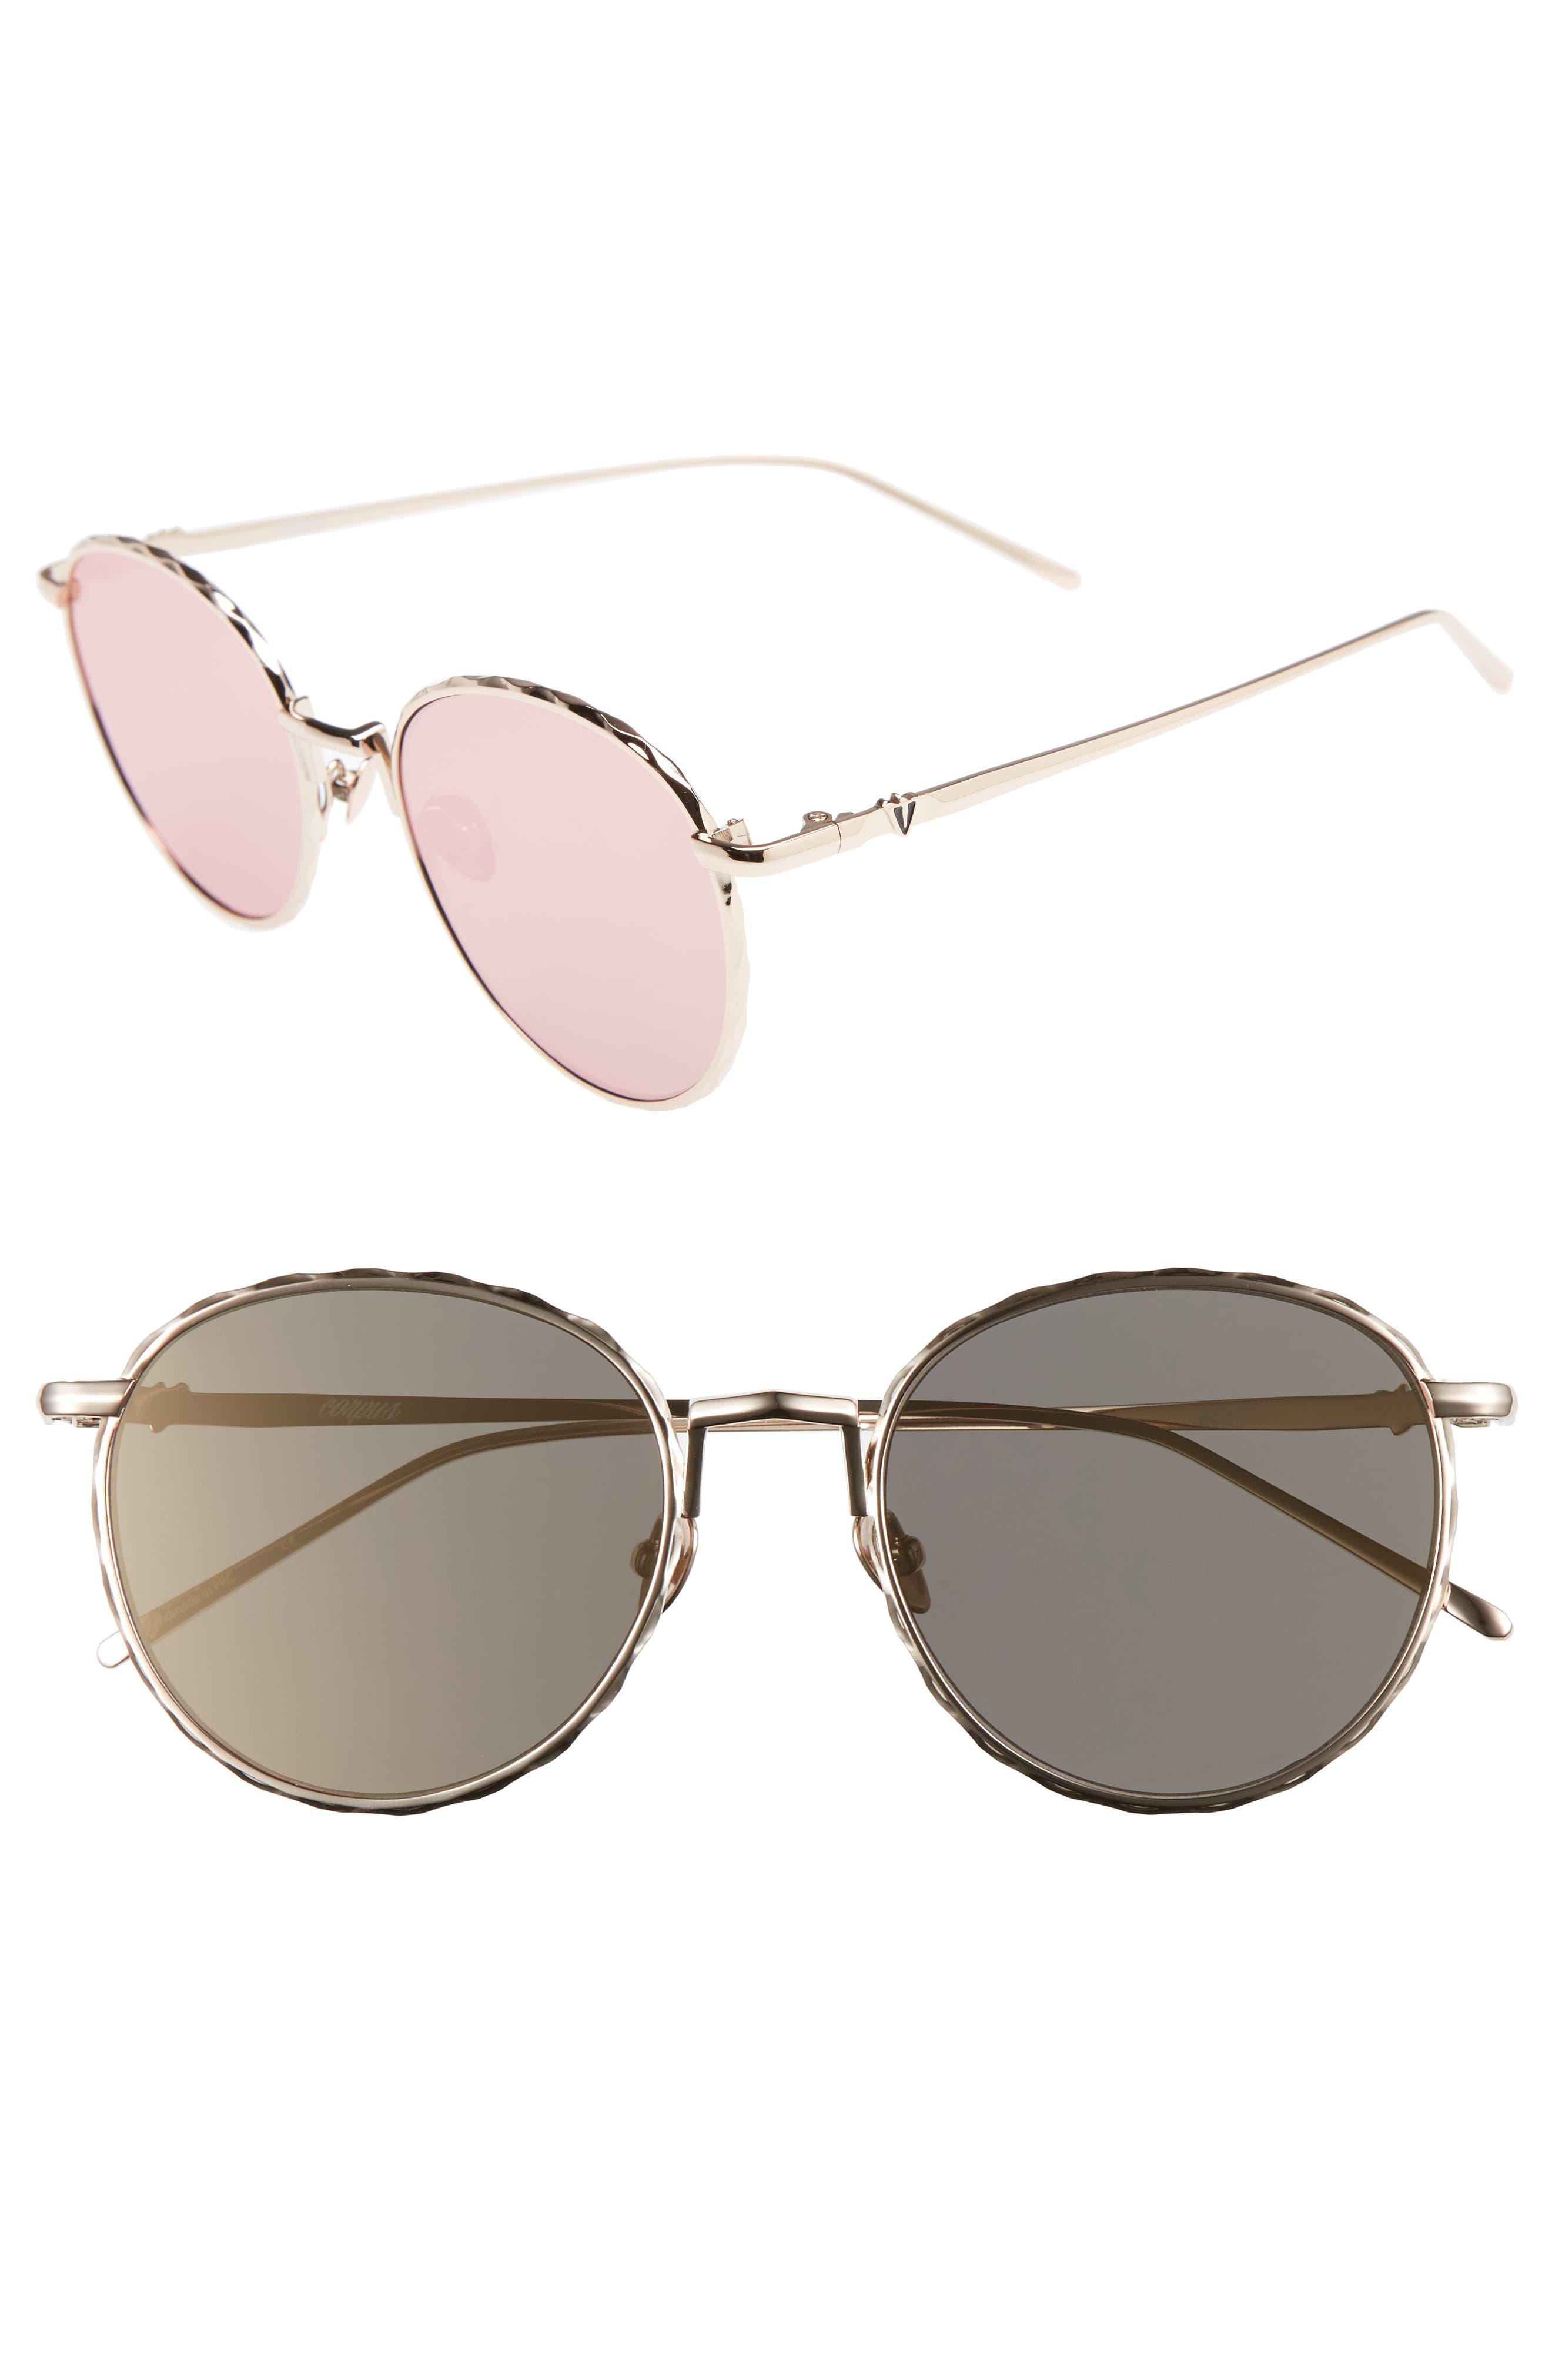 Main Image - VALLEY Corpus 53mm Round Sunglasses